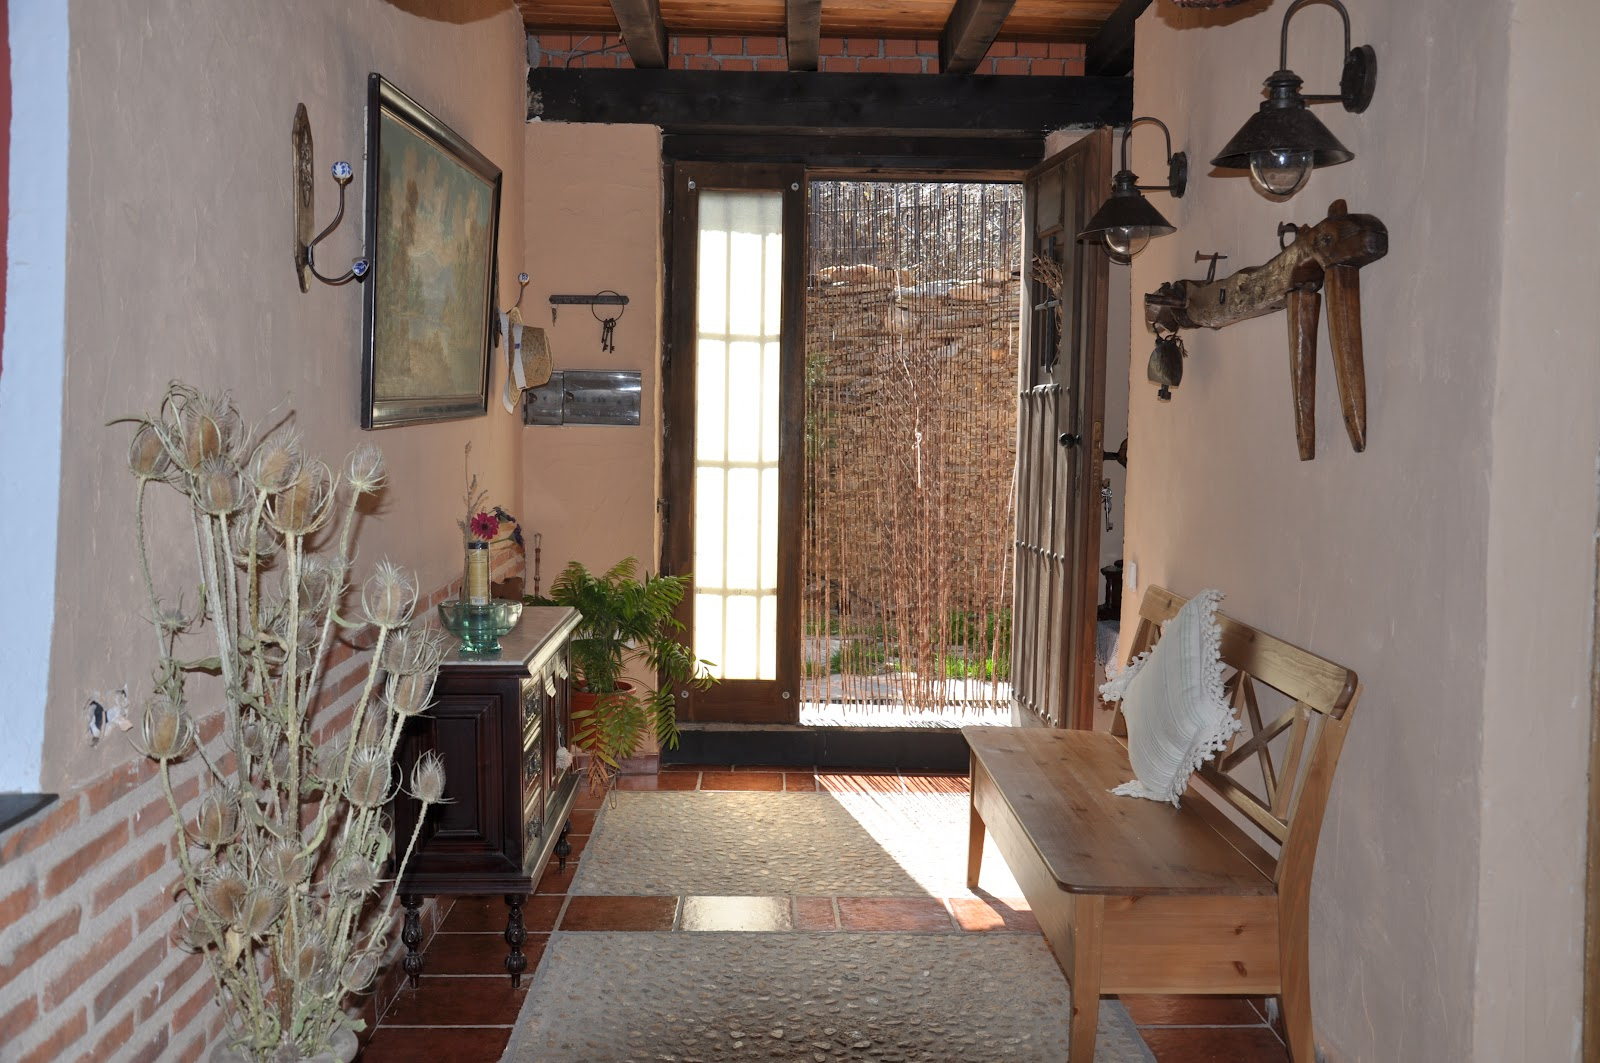 Entradas de casas rusticas pisos para entradas de casas - Entradas de casas rusticas ...